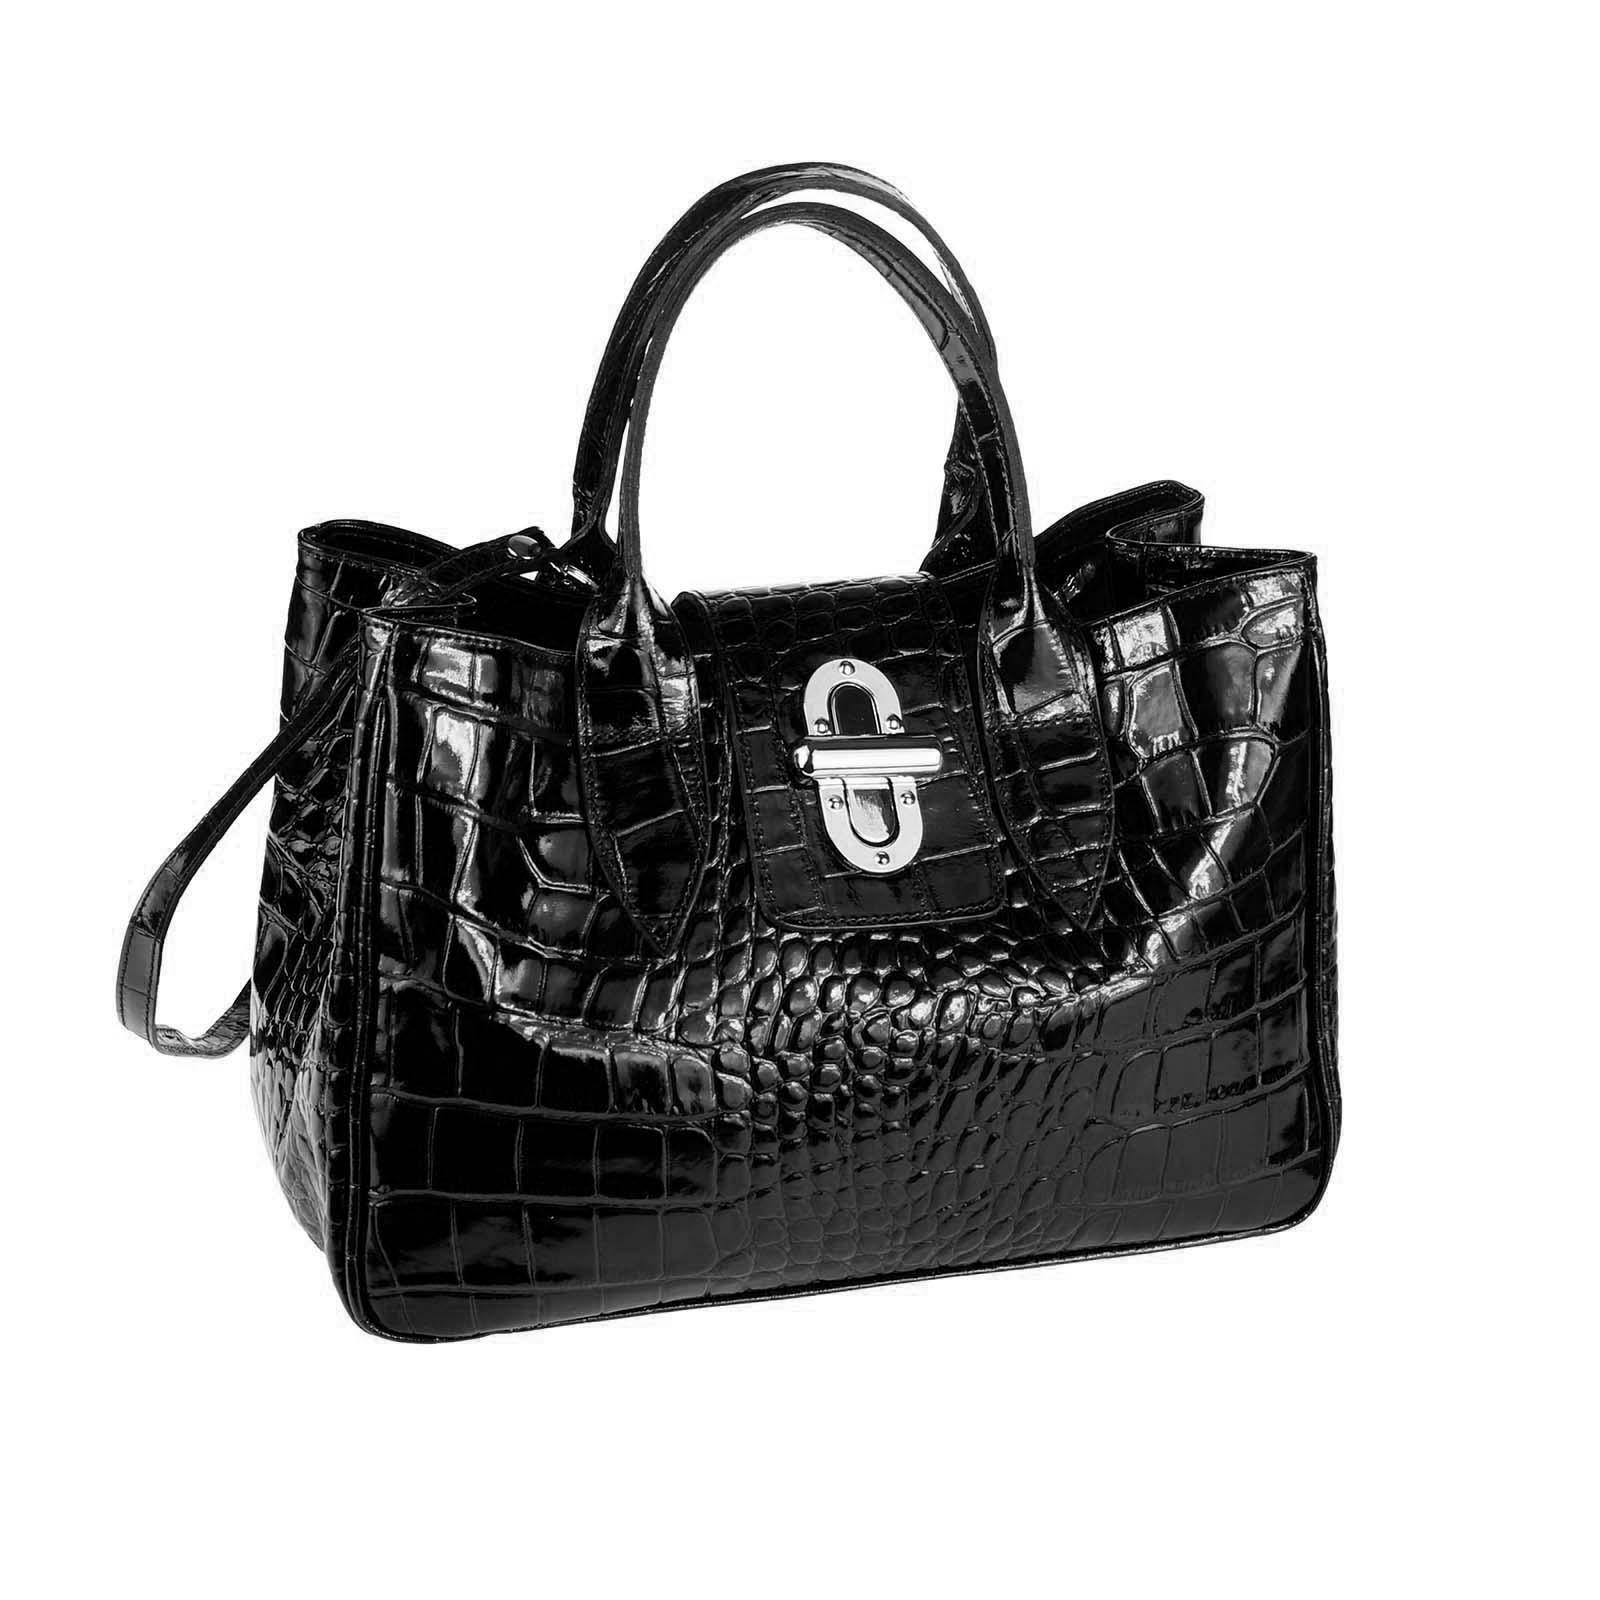 Main Shopping Femmes Vernis Business Sac À Anse Ital Pour Cuir Bandoulière qw7X6YZA